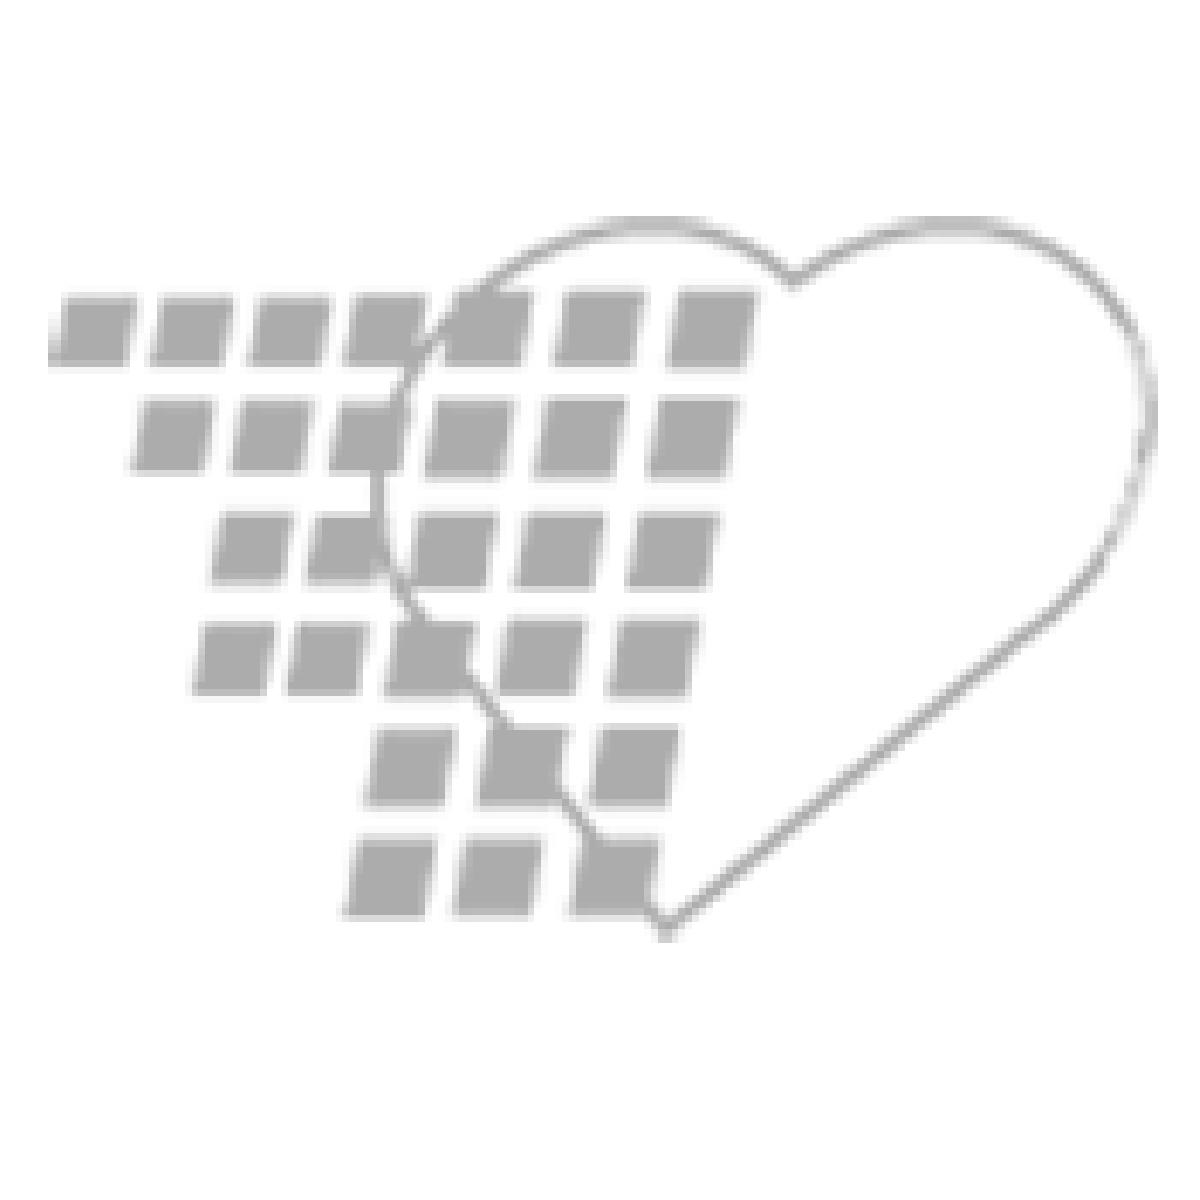 06-93-3825 - Demo Dose® Simulated Insulin Cartridges 3 mL